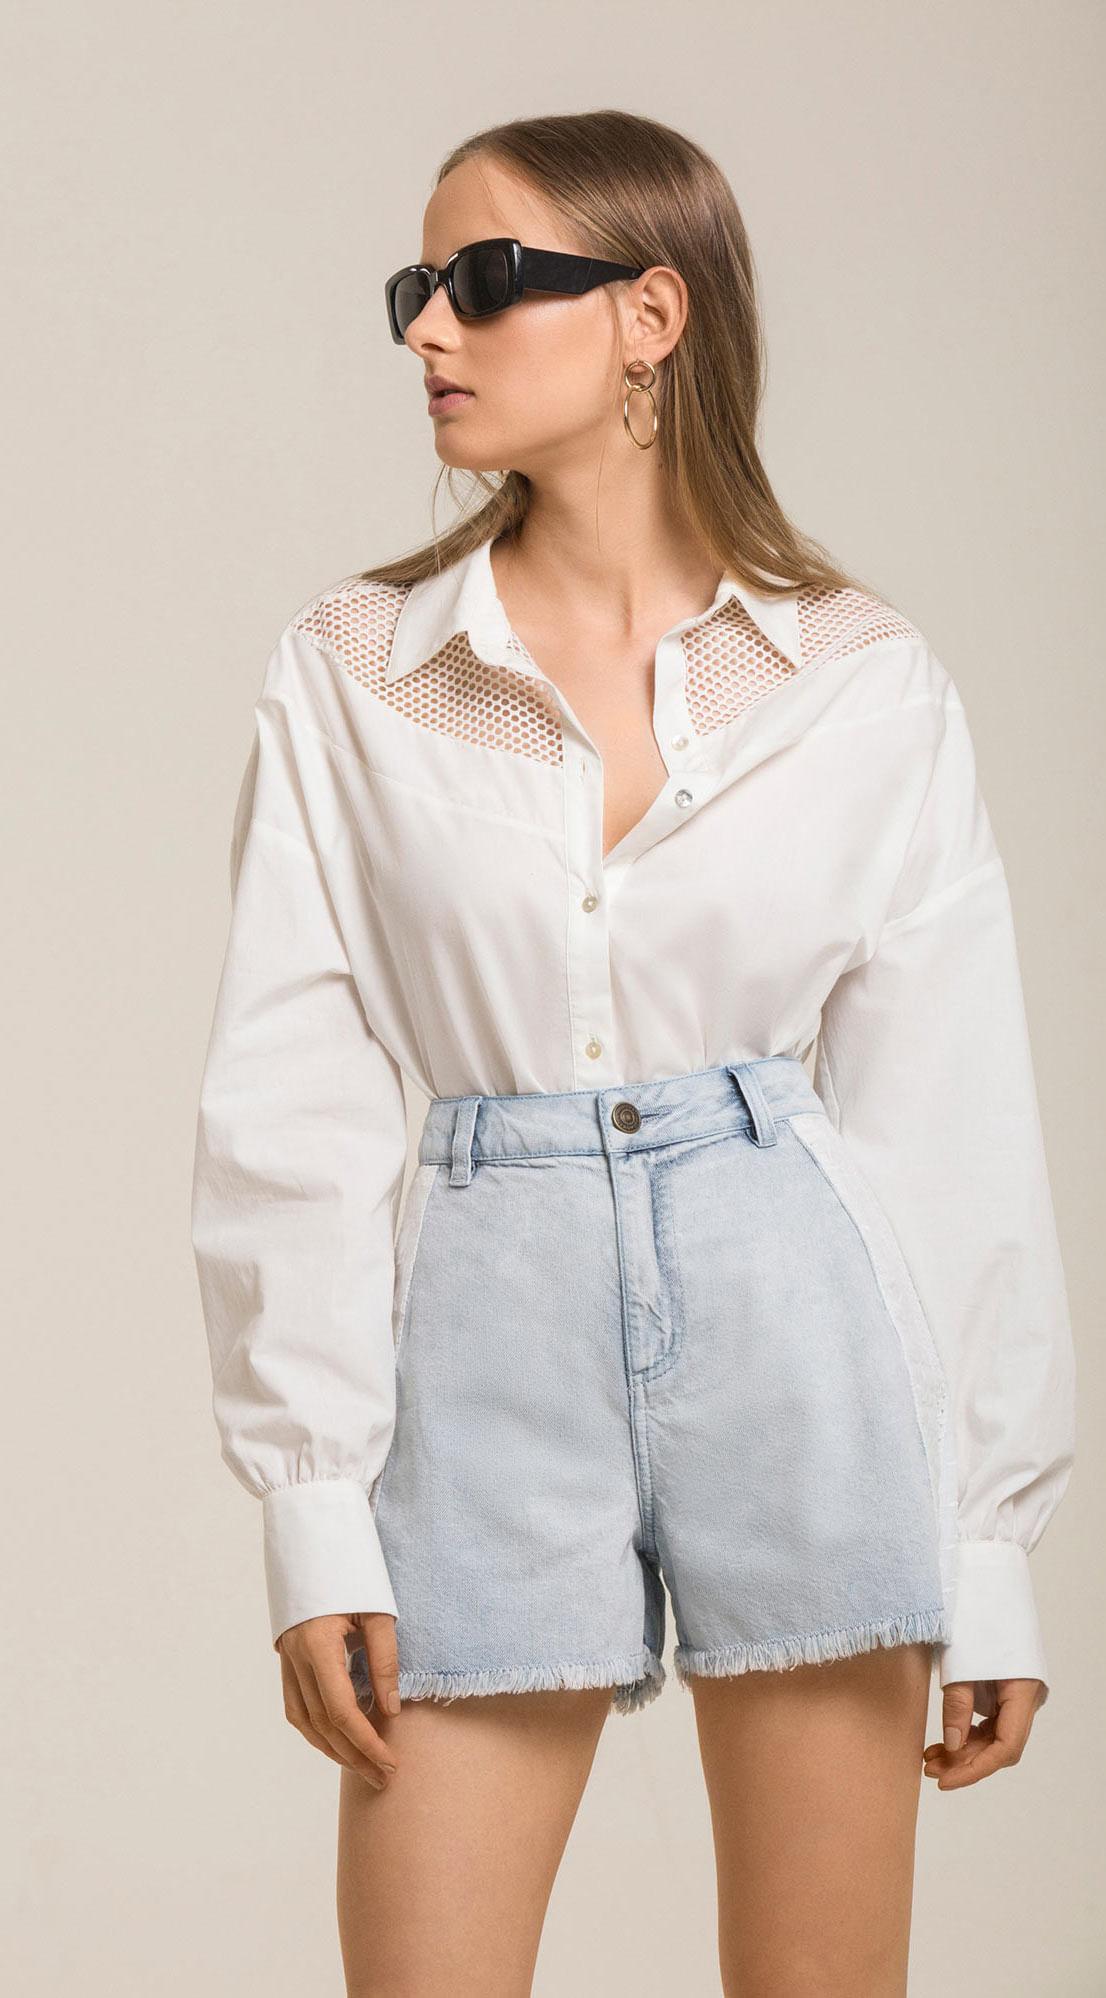 Camisa Manga Longa Detalhe Tela Off White abfc3f06f14